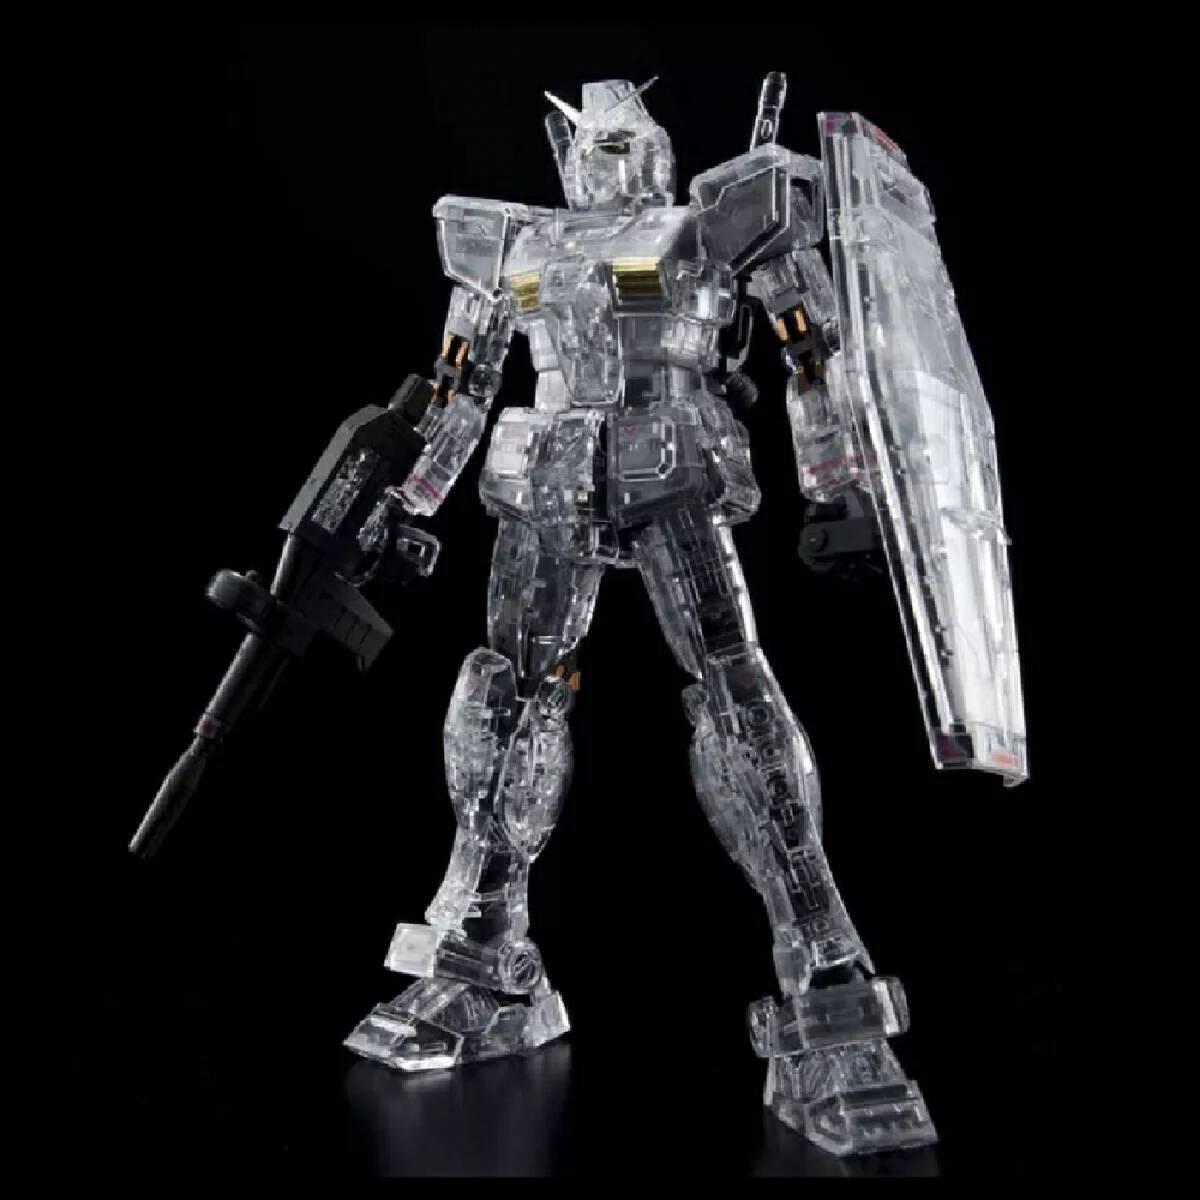 RG 1/144 RX-78-2 Gundam Mechanical Clear Ver